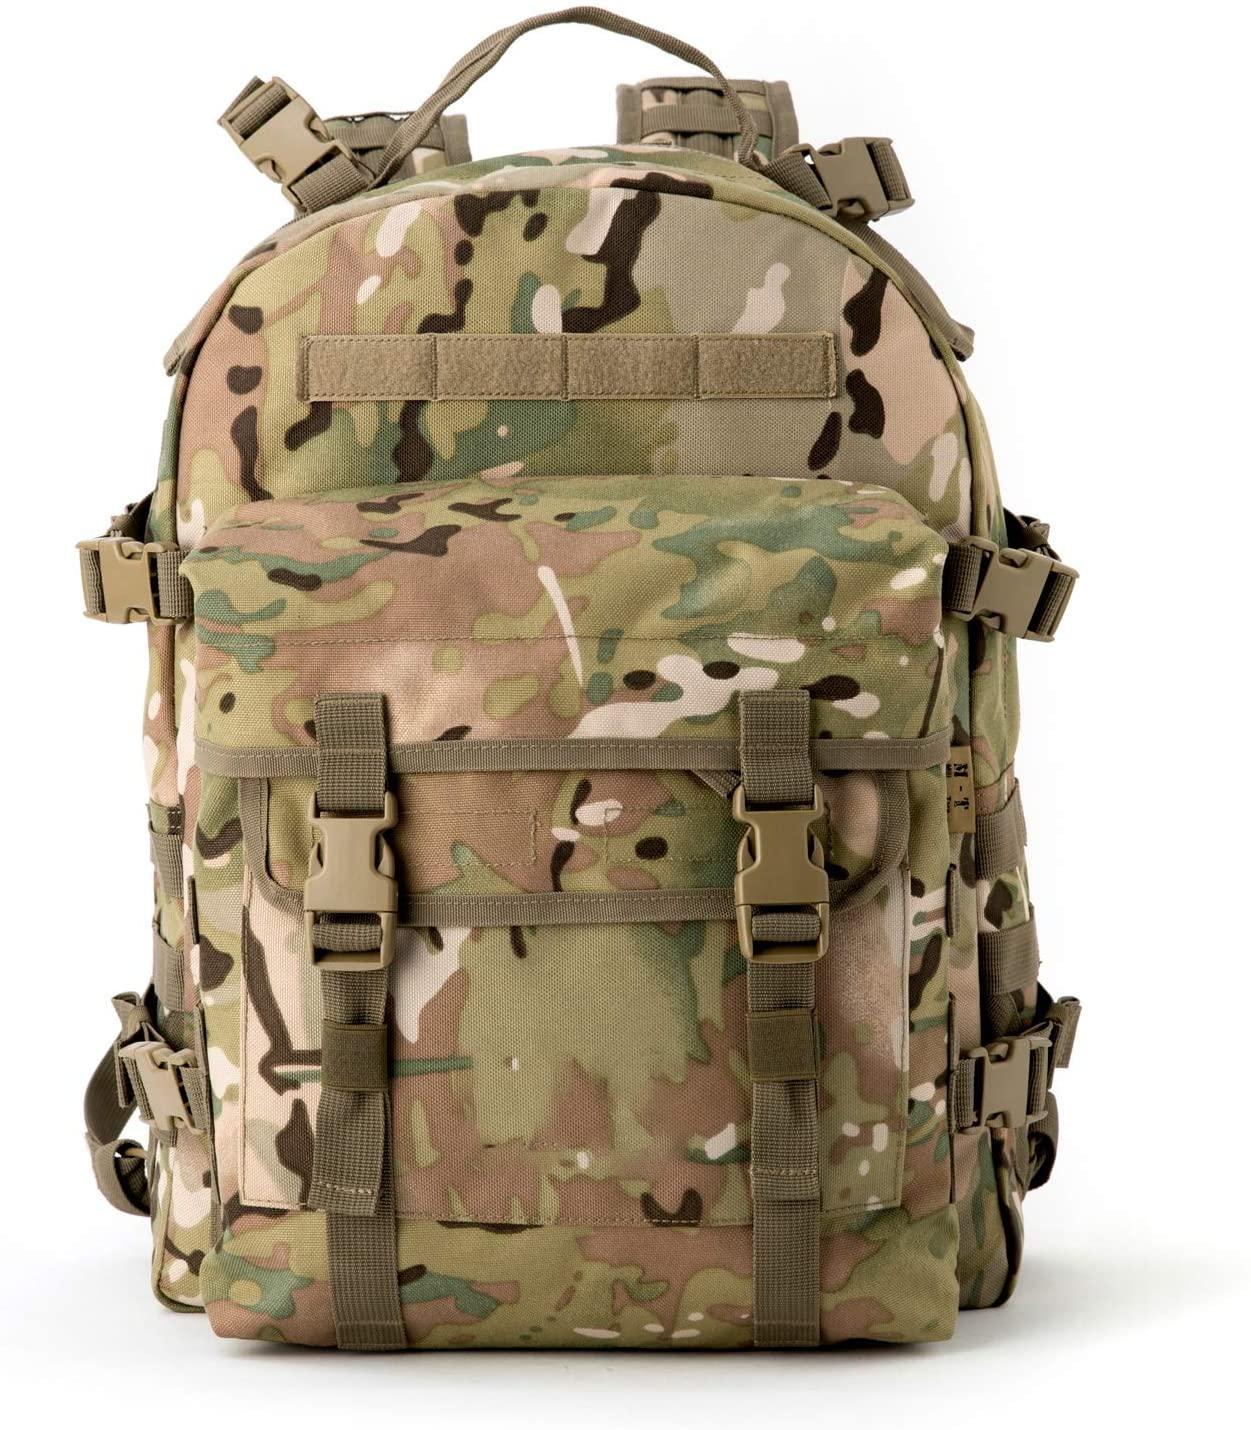 MT Molle II Rifleman Military Surplus Assault Pack Army Tactical Backpack Multicam, Medium